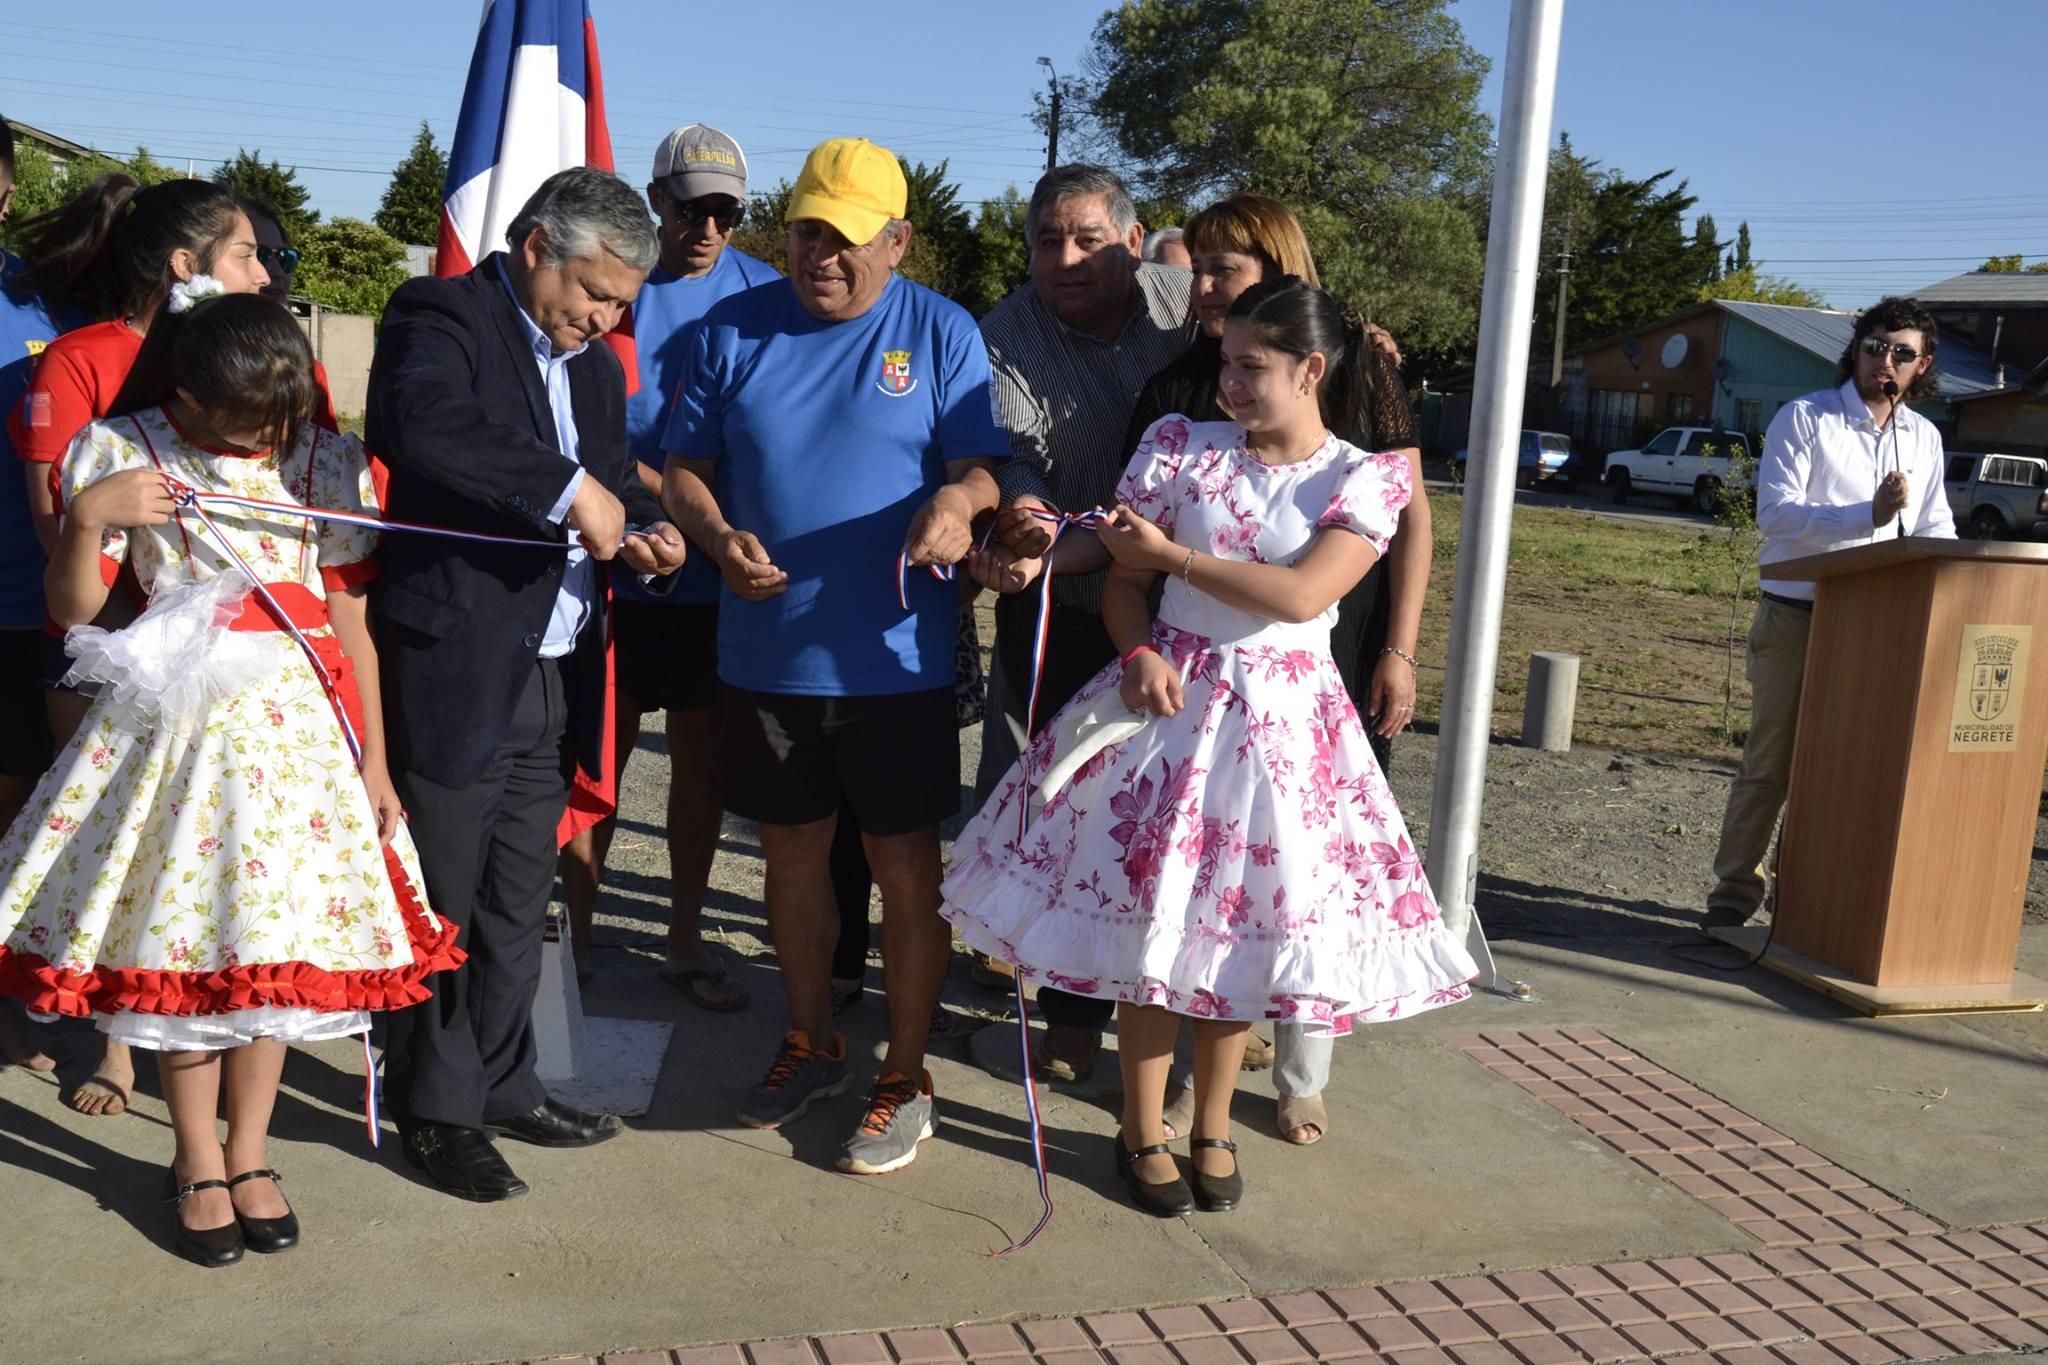 NEGRETE CONVIERTE POLO  DE DELINCUENCIA EN PLAZA CIUDADANA INCLUSIVA